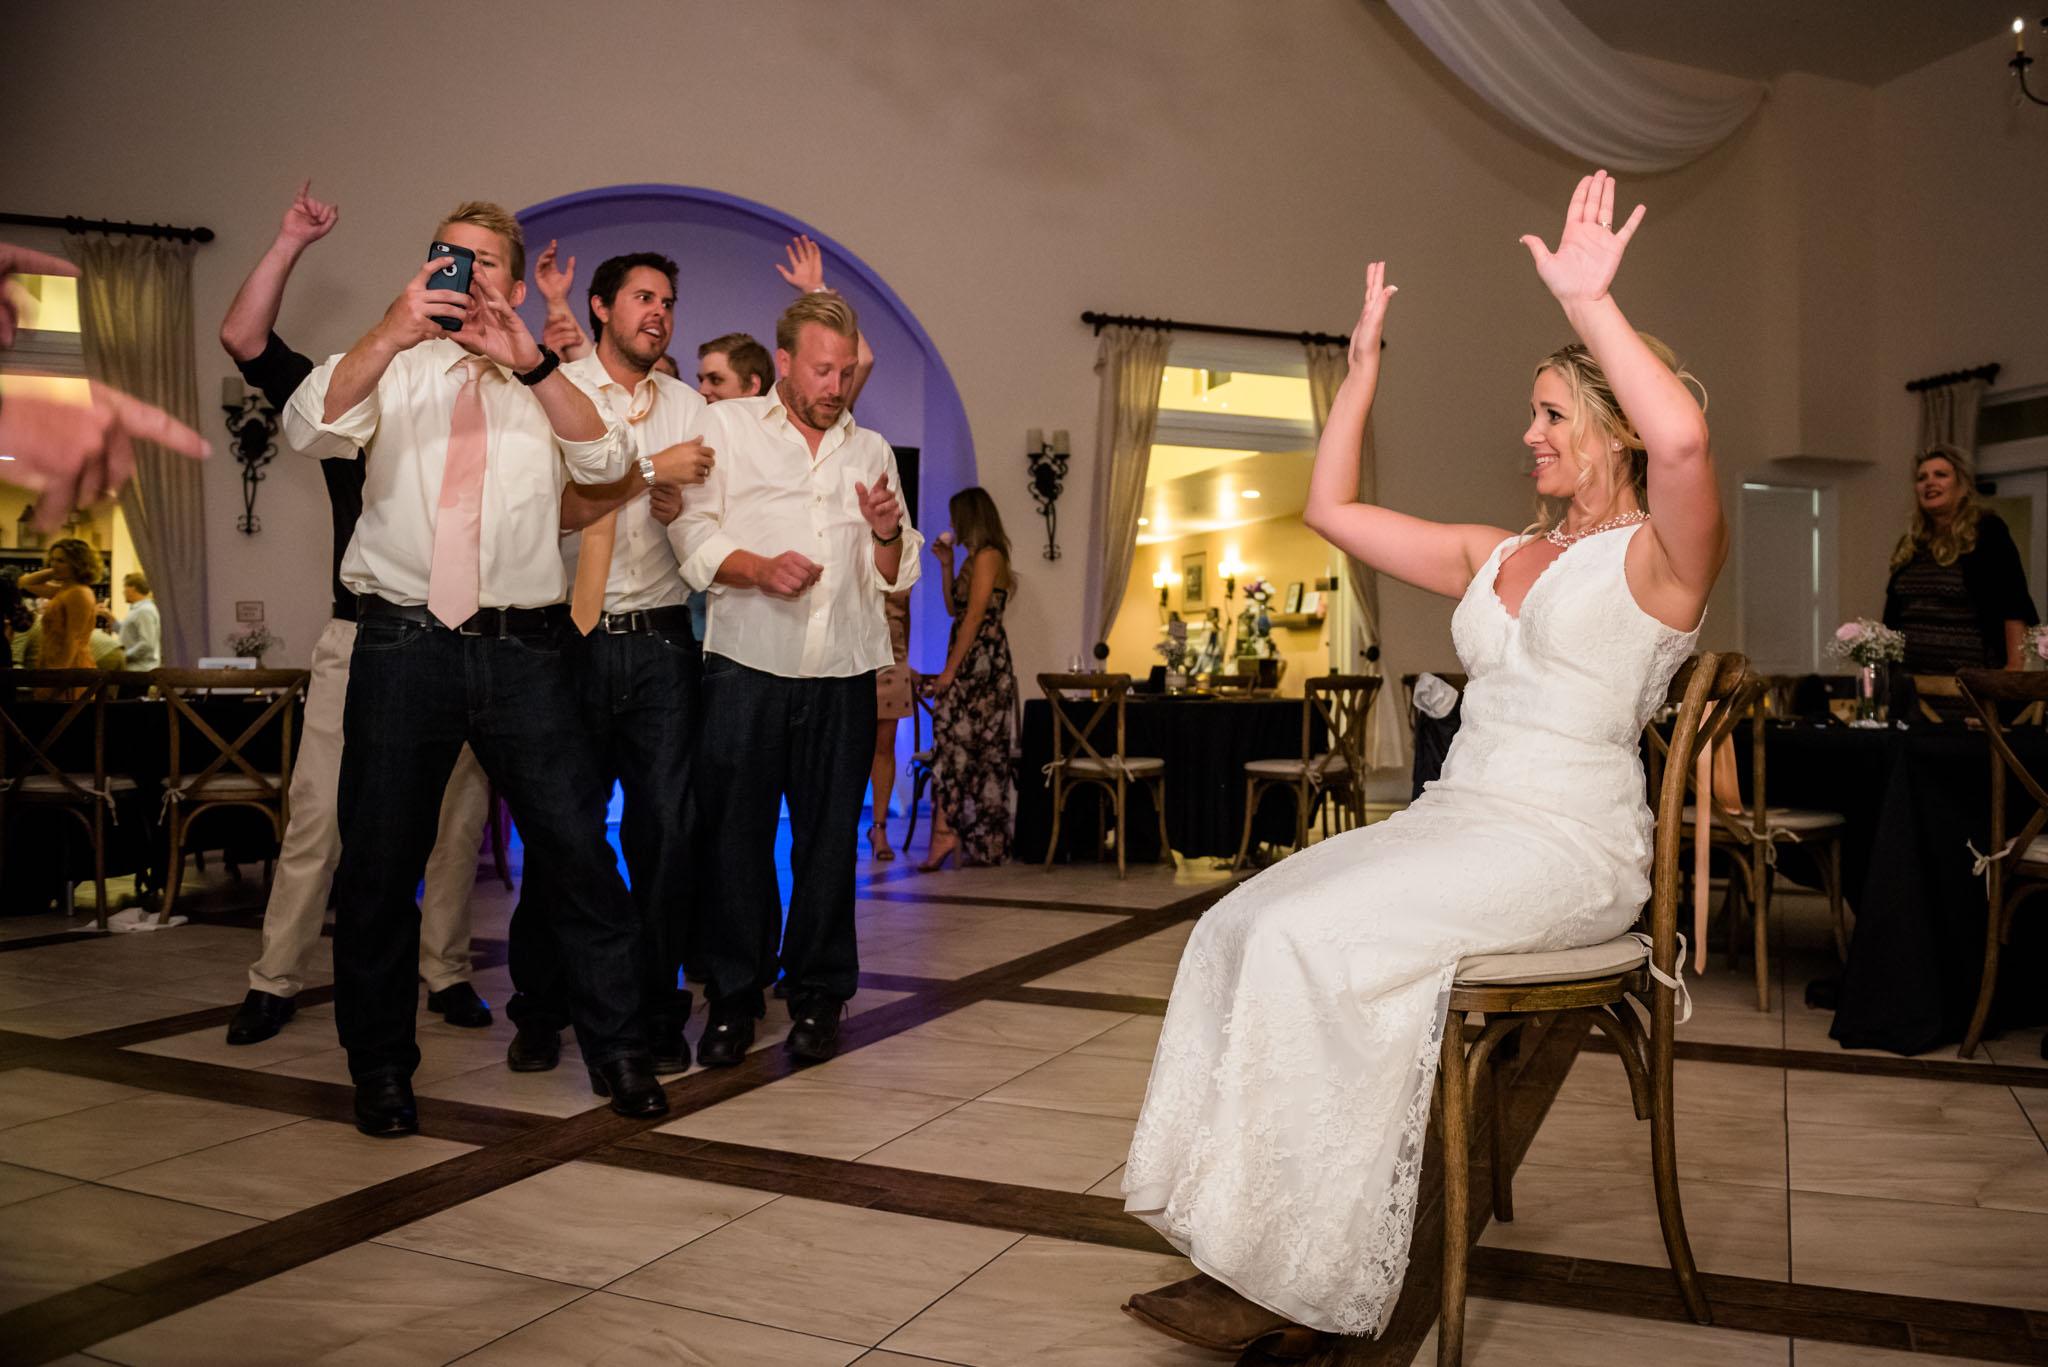 Avensole-Winery-Temecula-Wedding-Josh-and-Olivia-4433.JPG